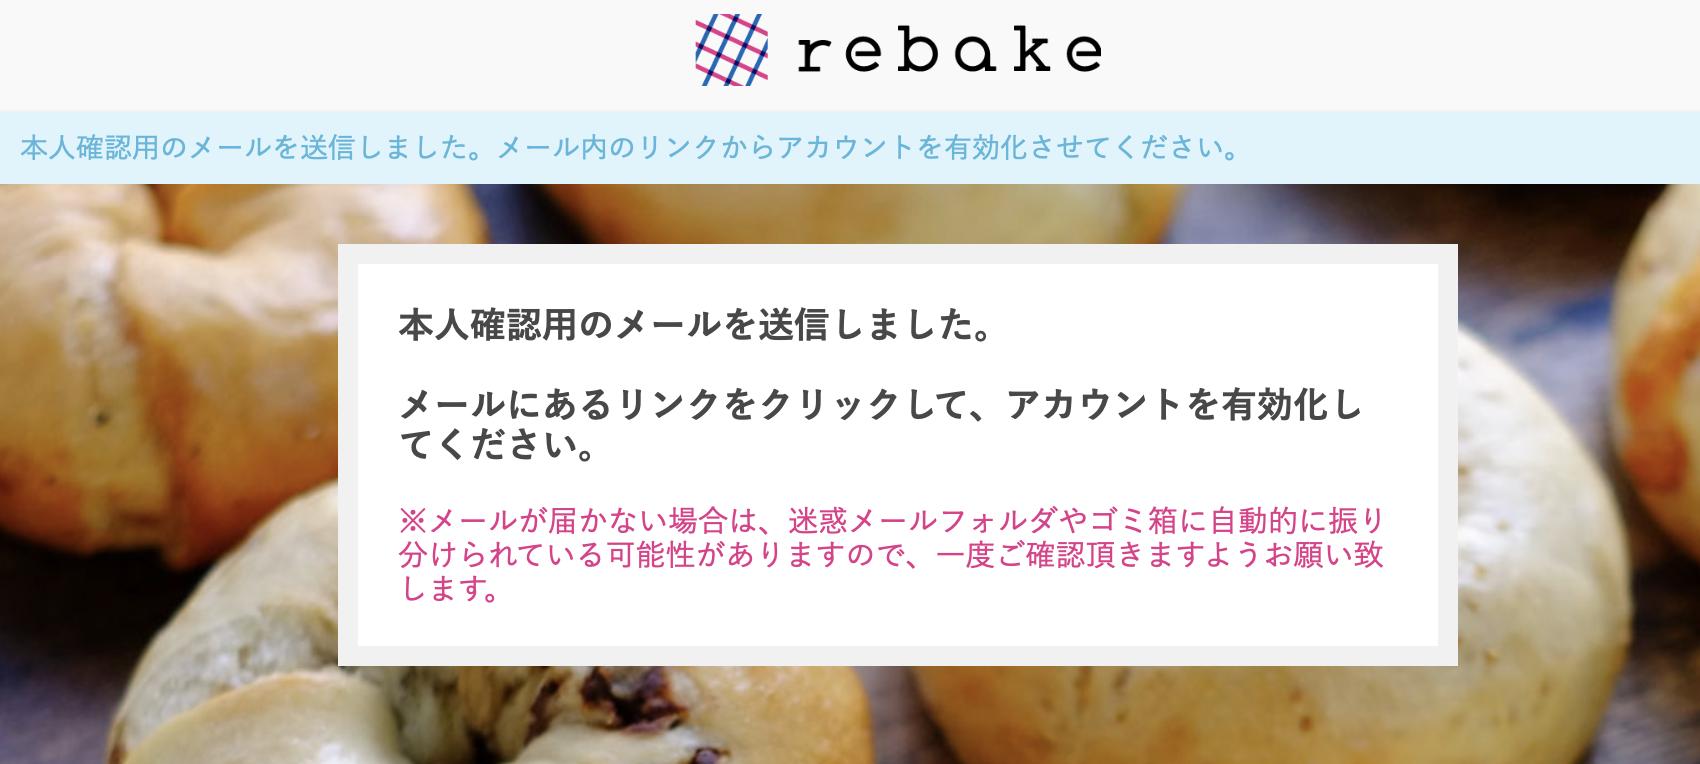 rebake 登録②